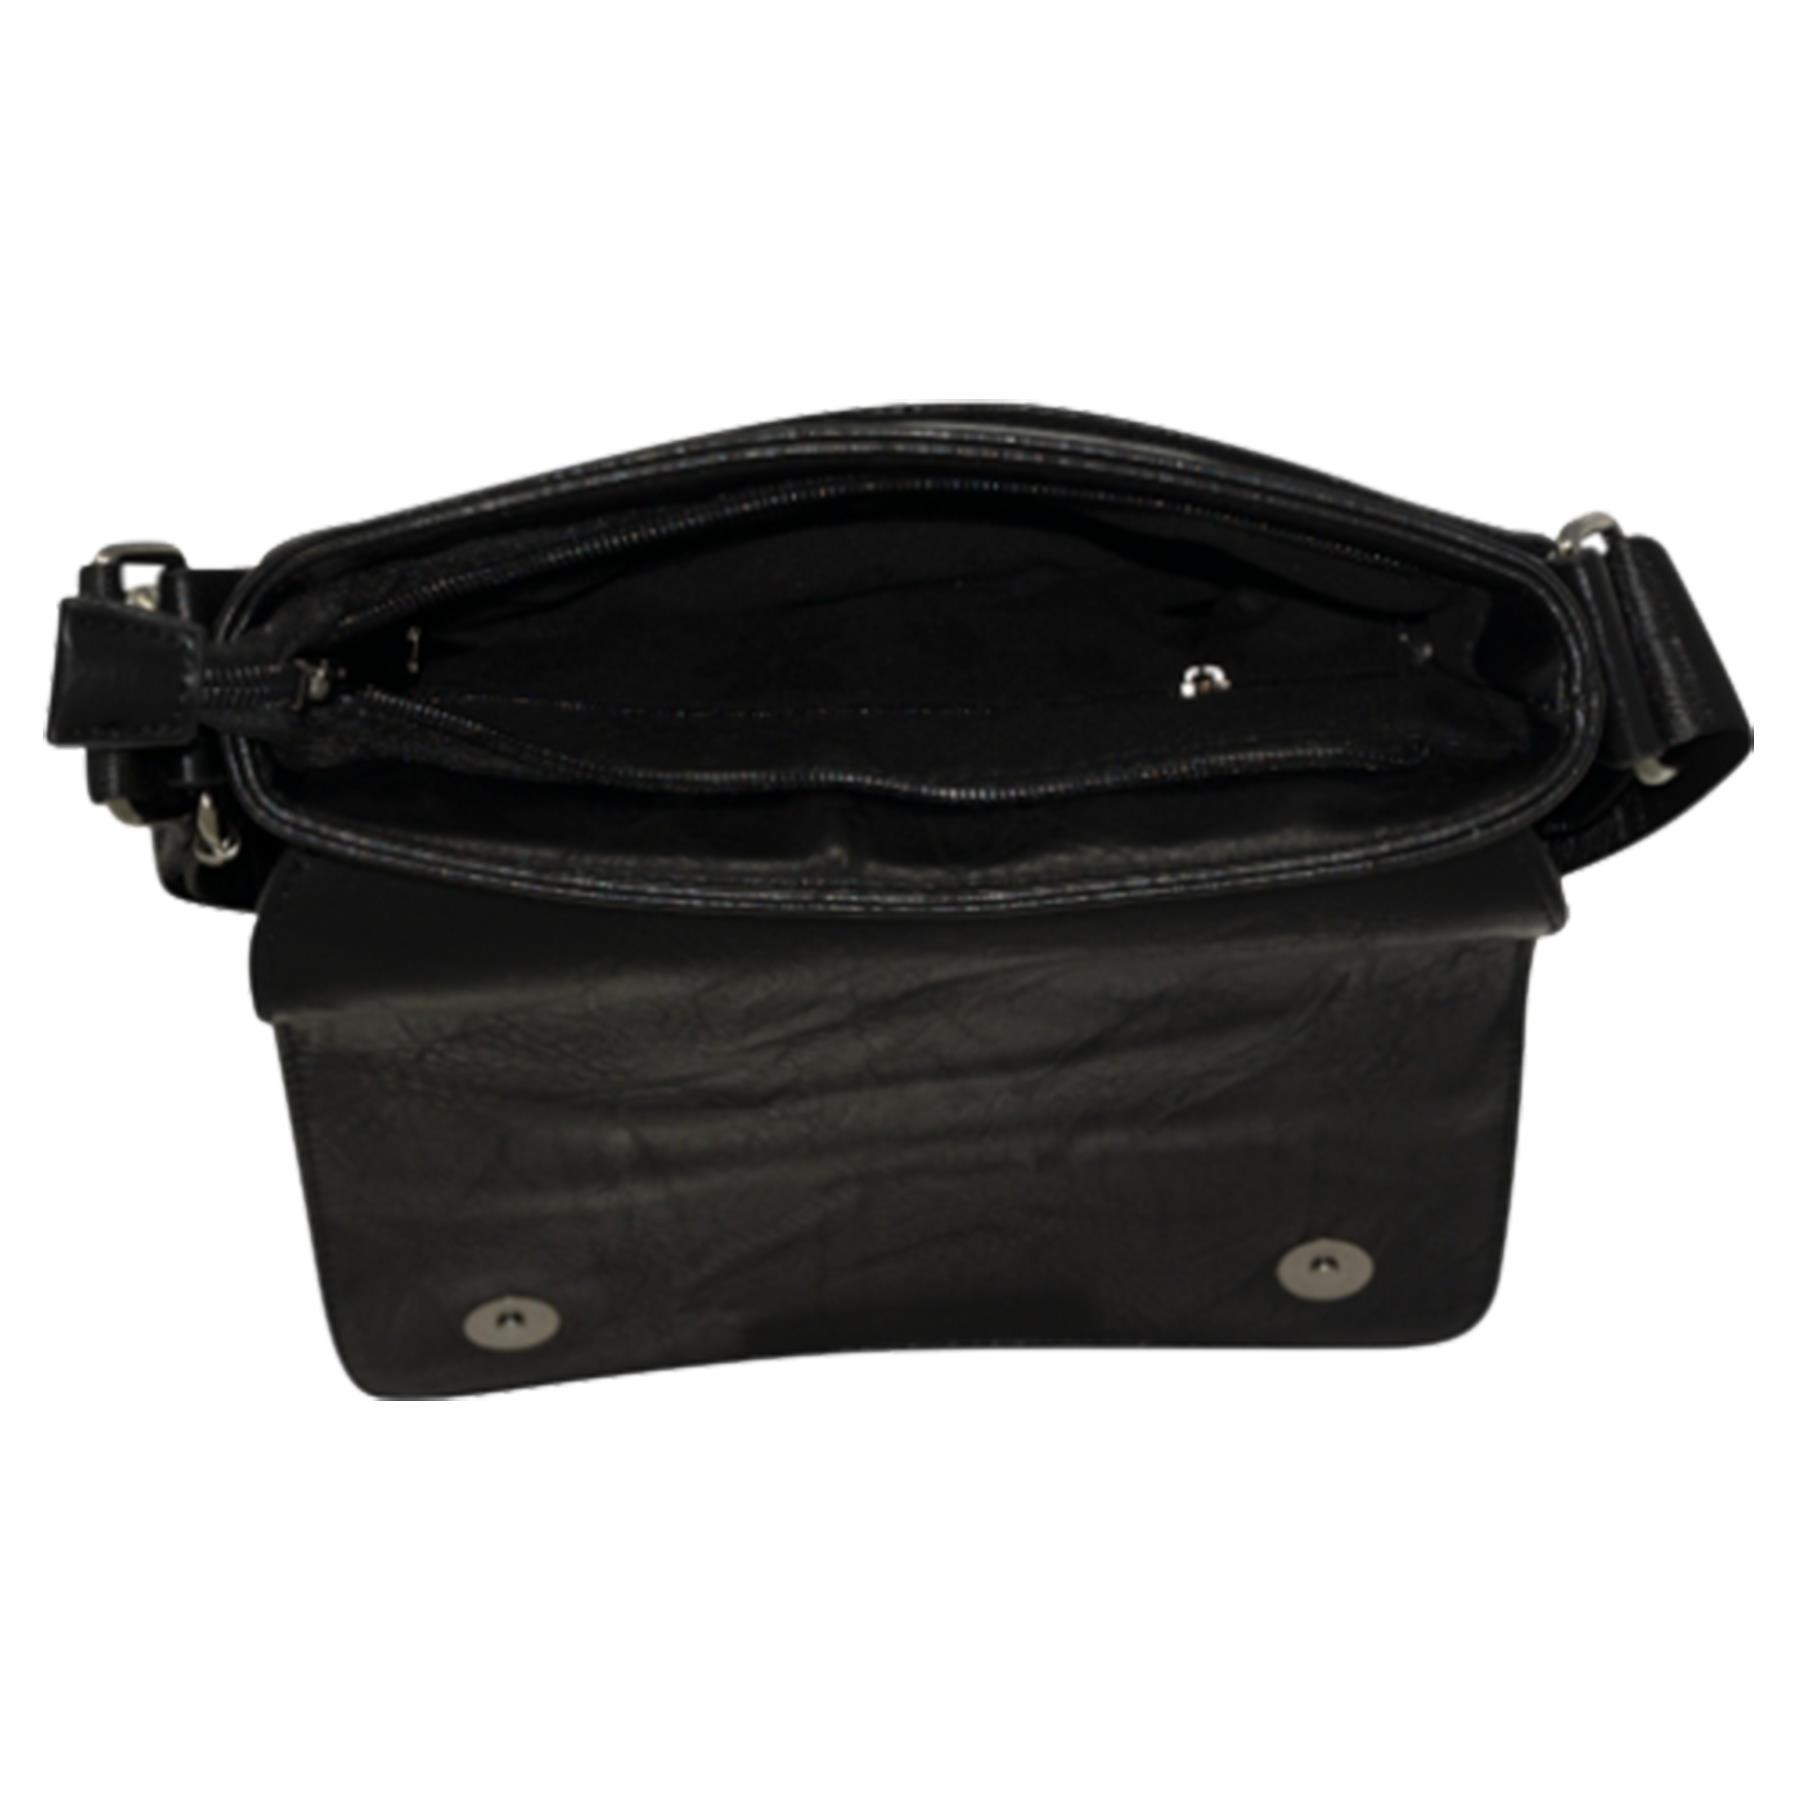 New-Plain-Faux-Leather-Men-s-Travel-Casual-Flap-Over-Messenger-Bag thumbnail 5